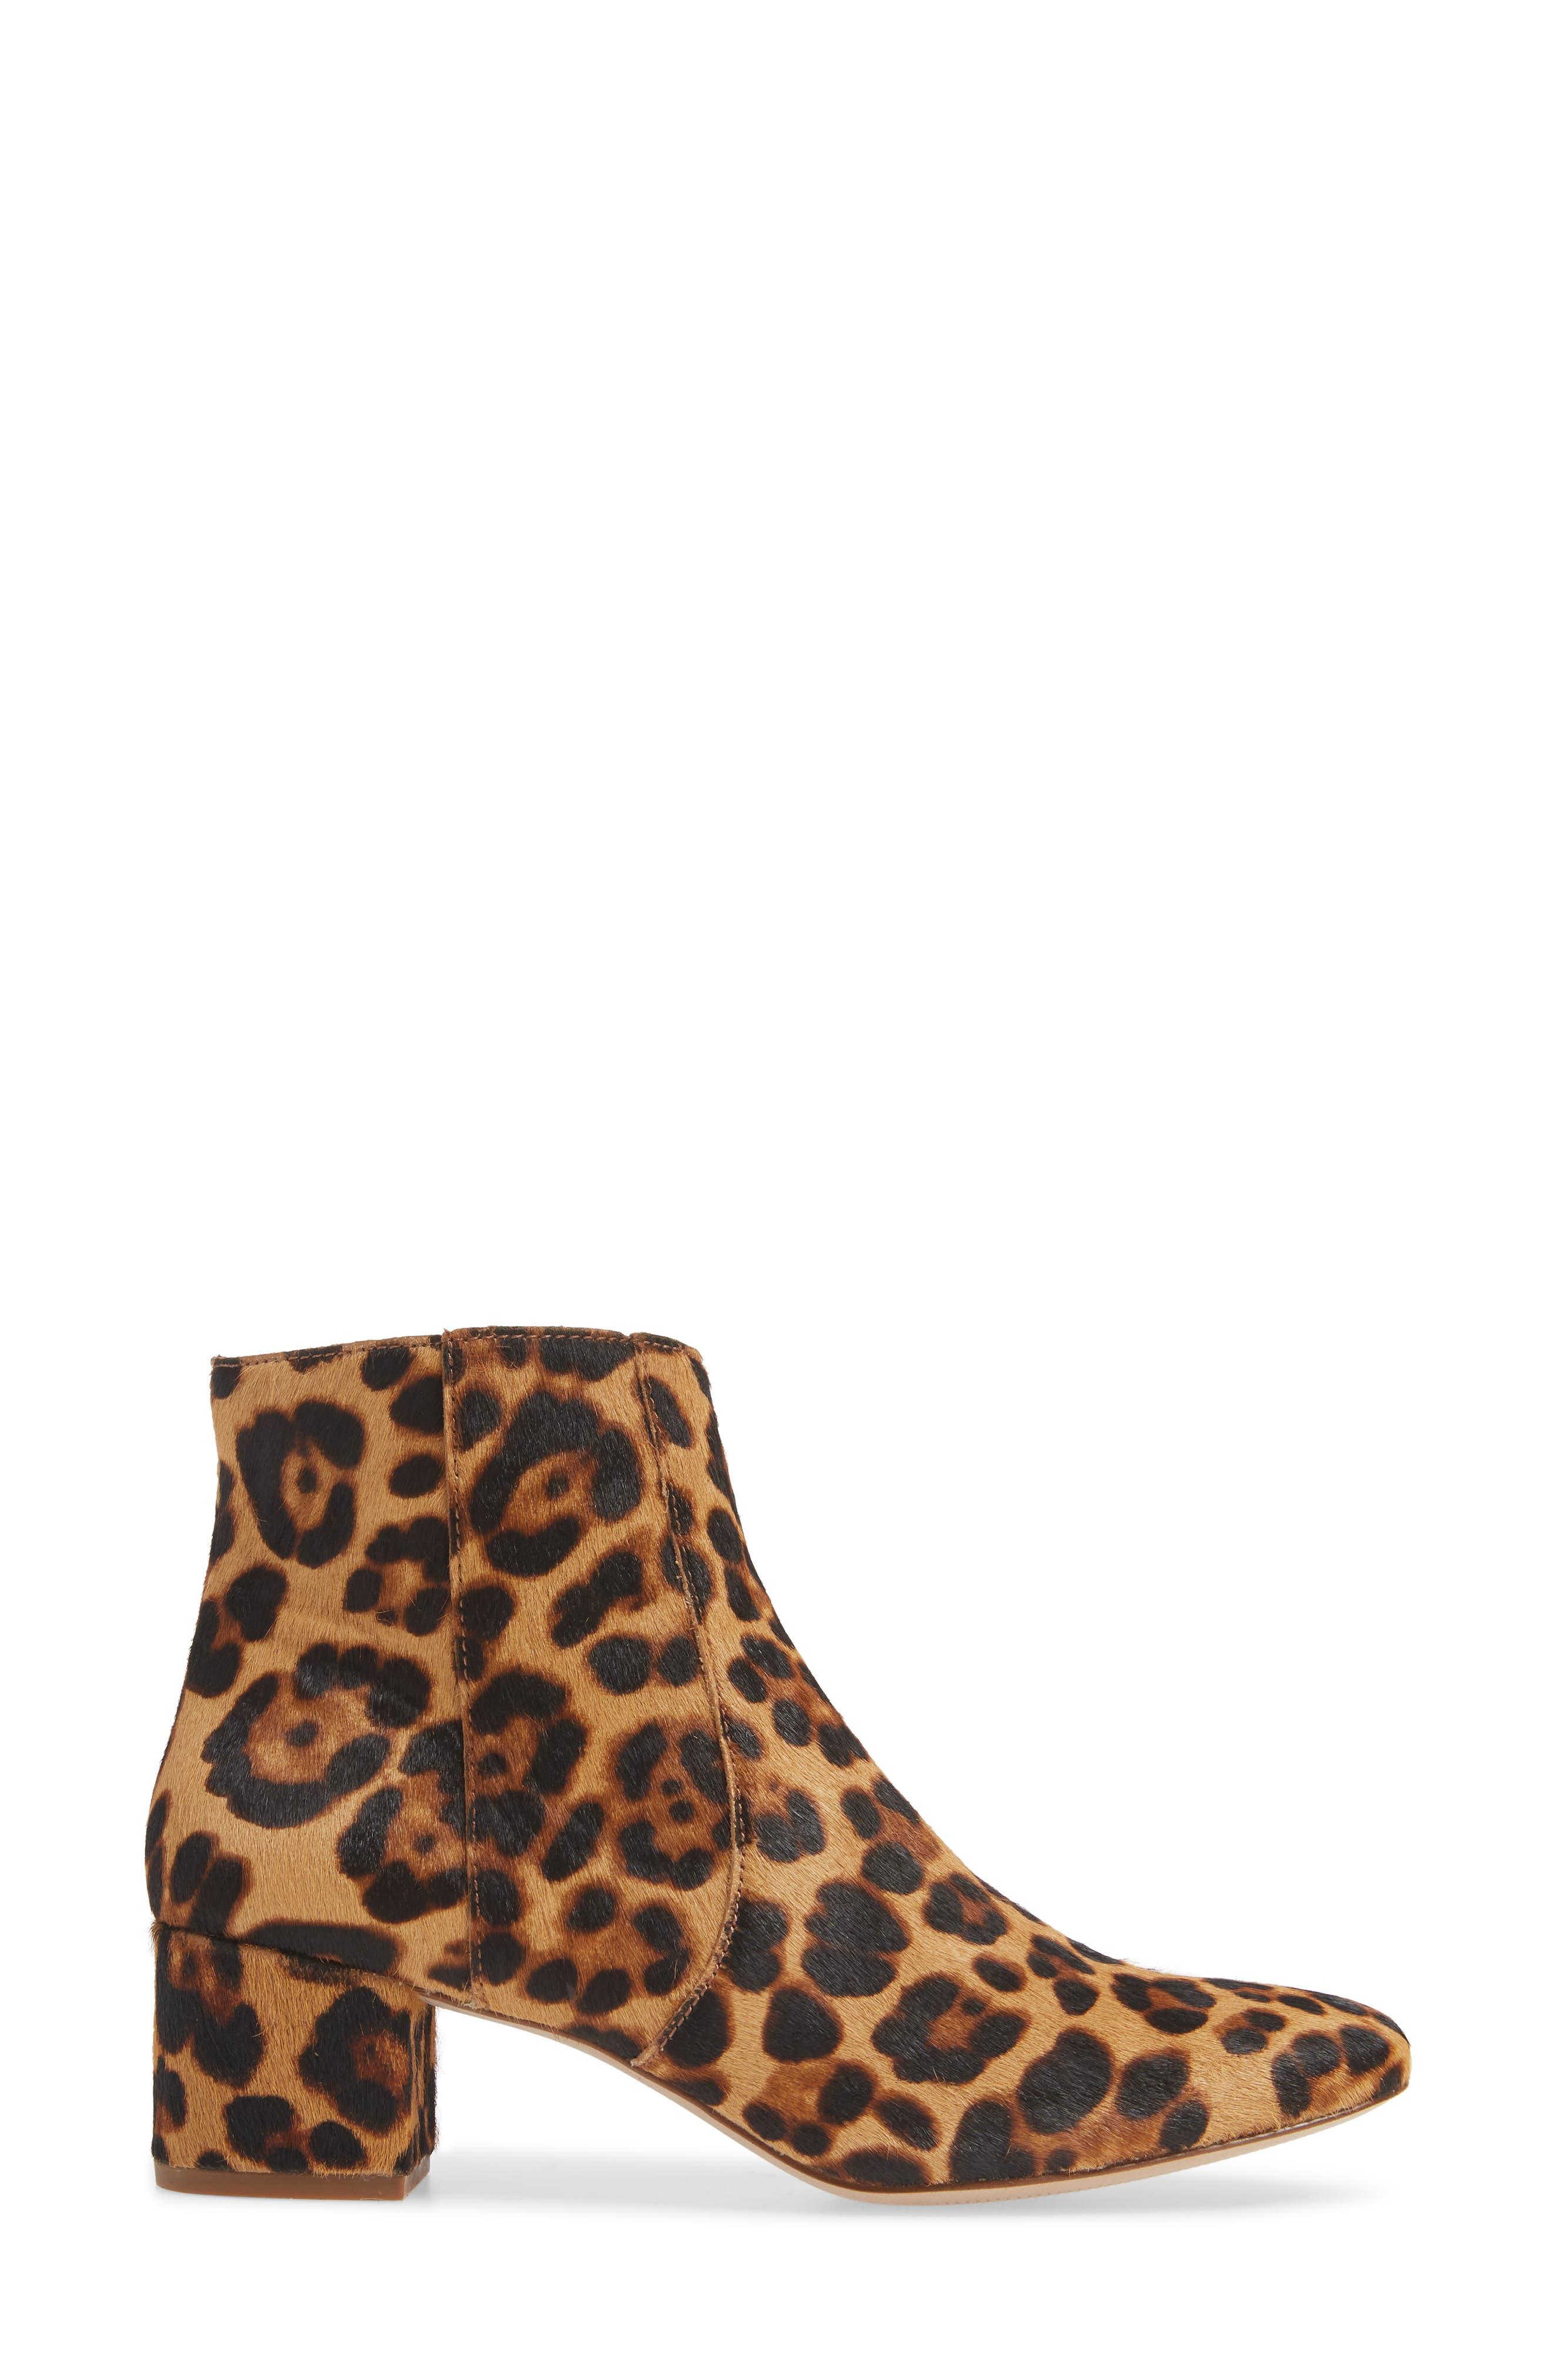 MADEWELL, The Jada Genuine Calf Hair Boot, Alternate thumbnail 3, color, 200